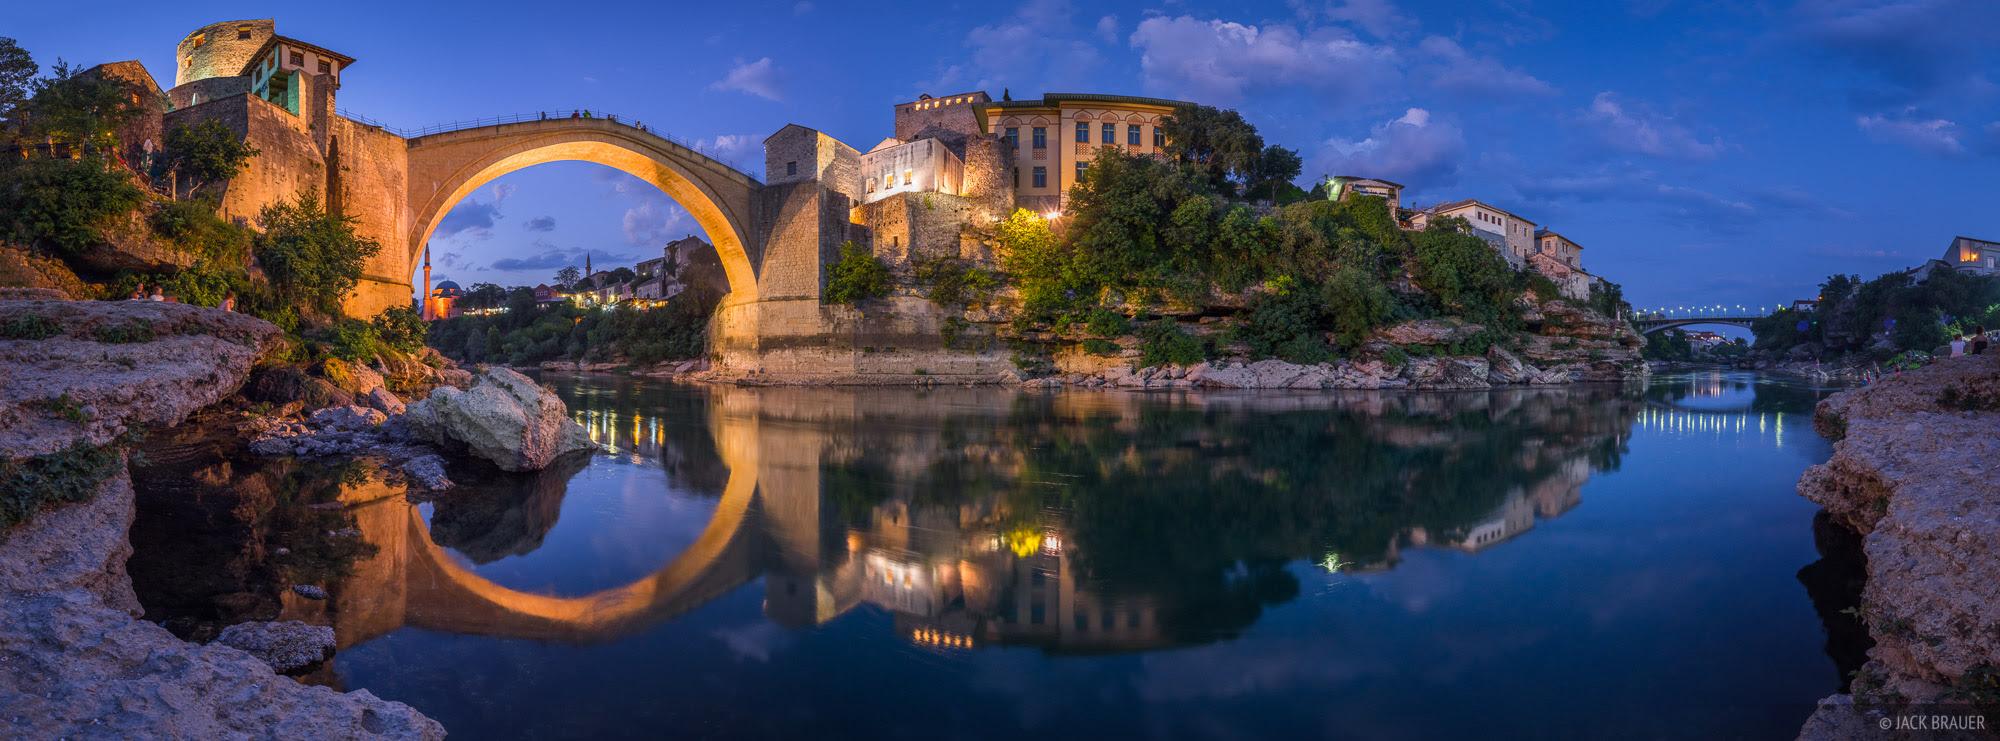 20150805 Mostar Reflection